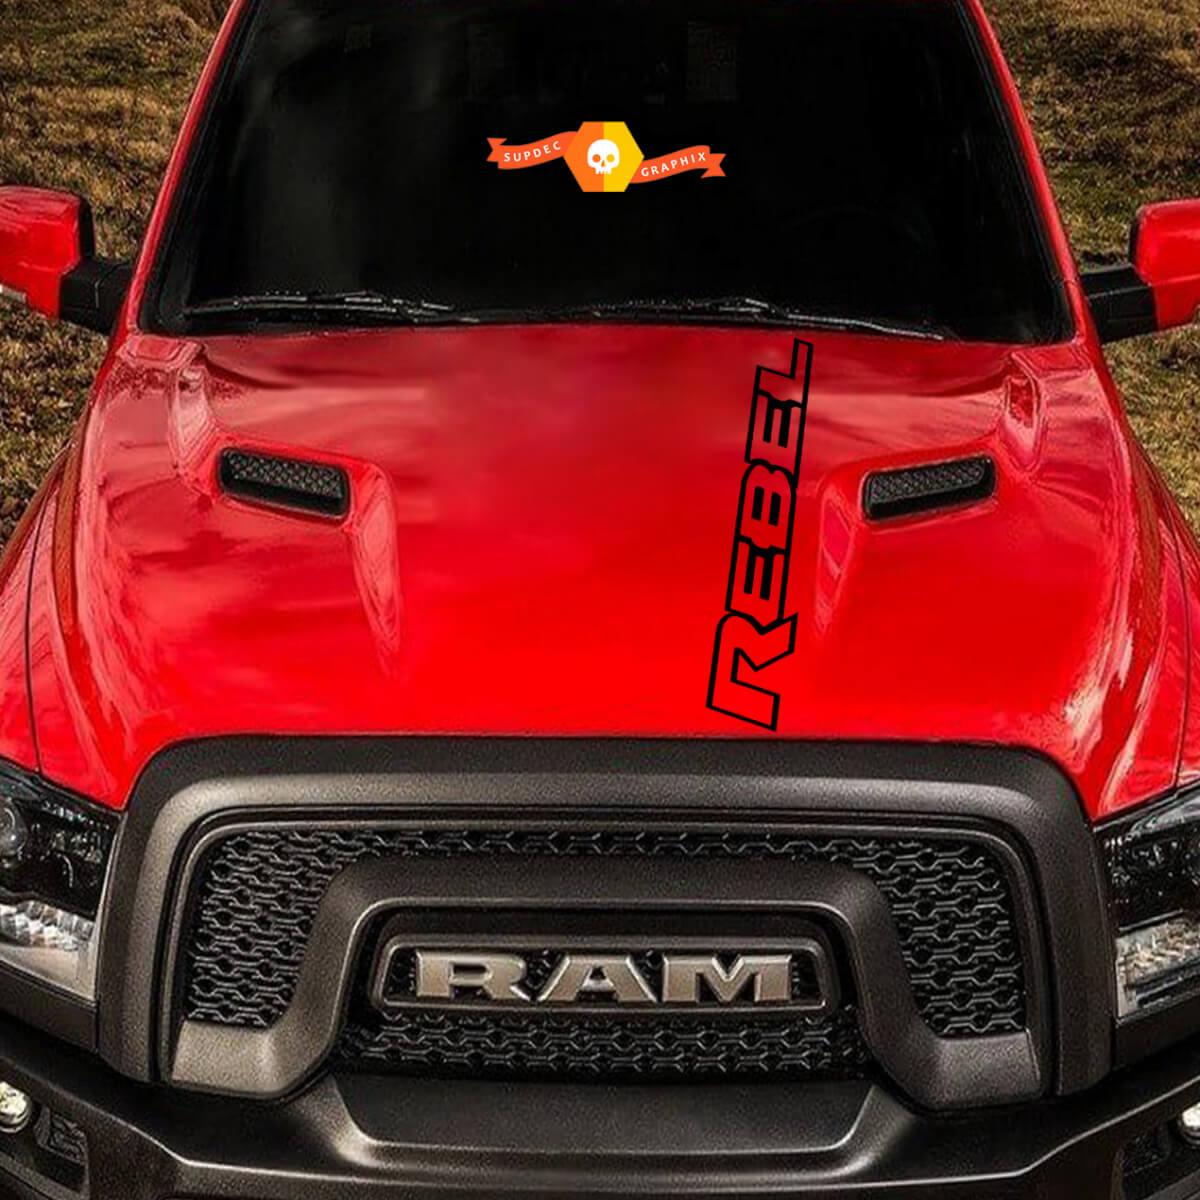 Dodge Ram Rebel Logo Seite Flare Truck Vinyl Aufkleber Grafik Camo Chrome